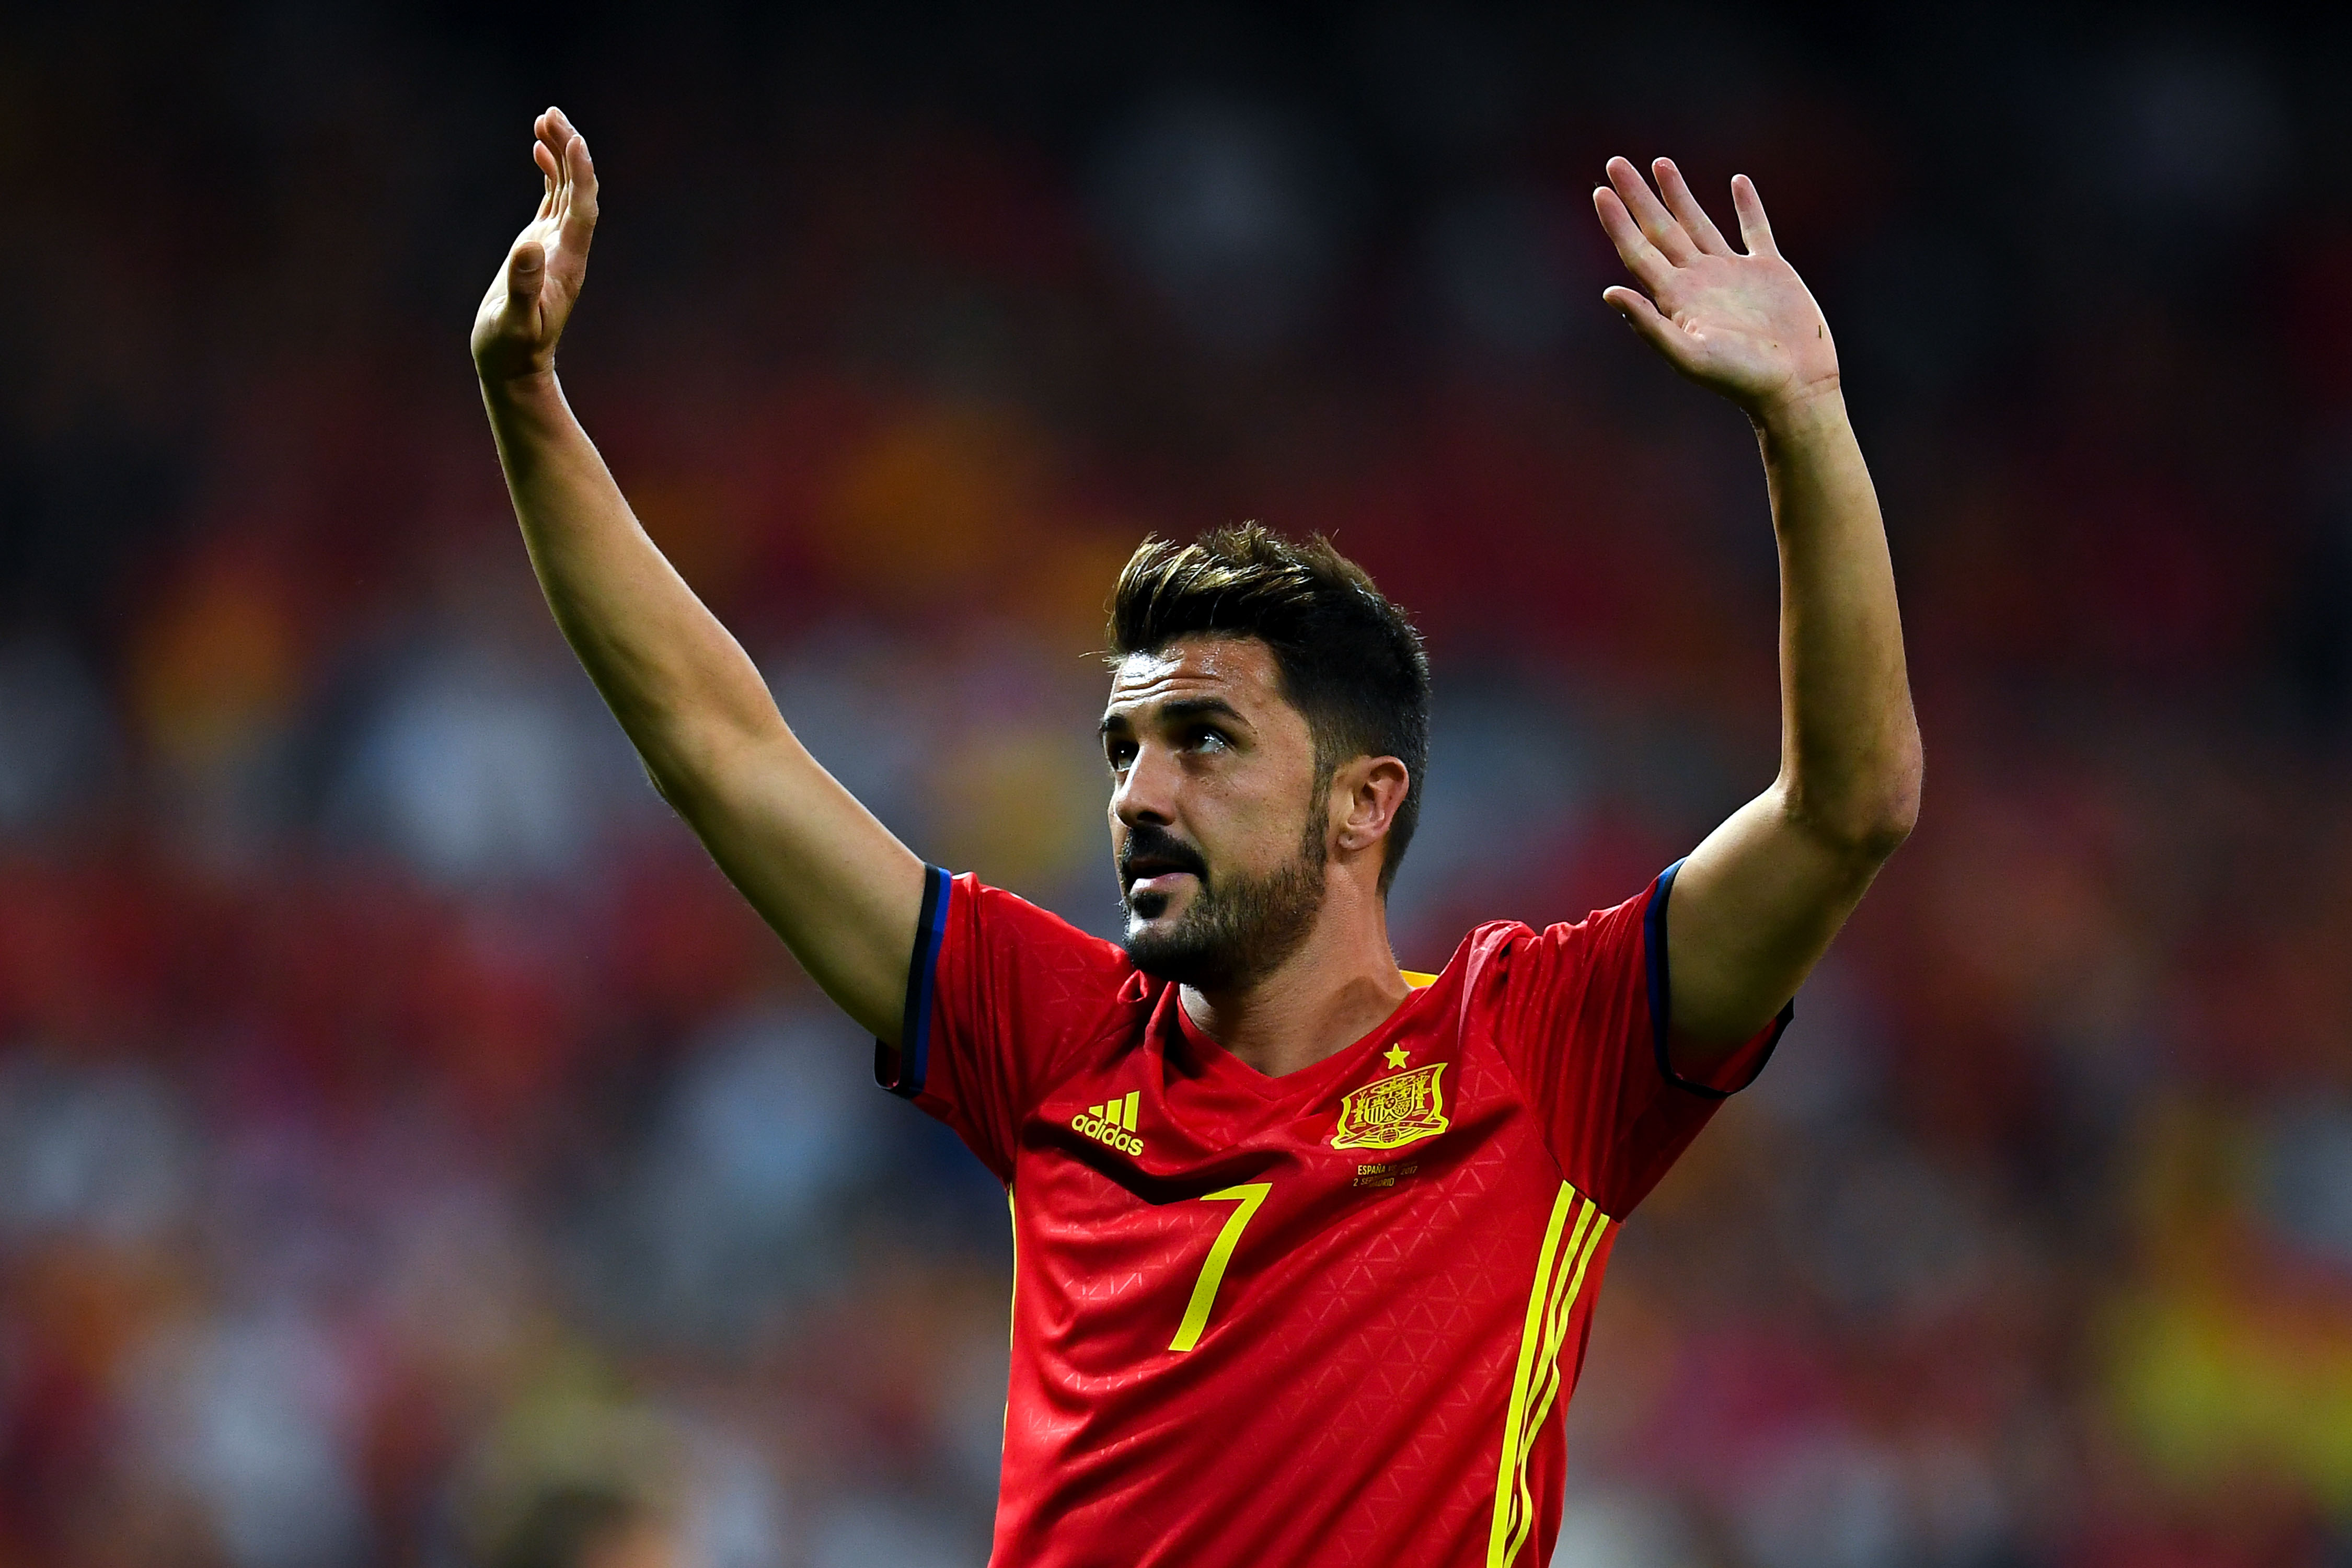 David Villa announces his retirement after glittering career